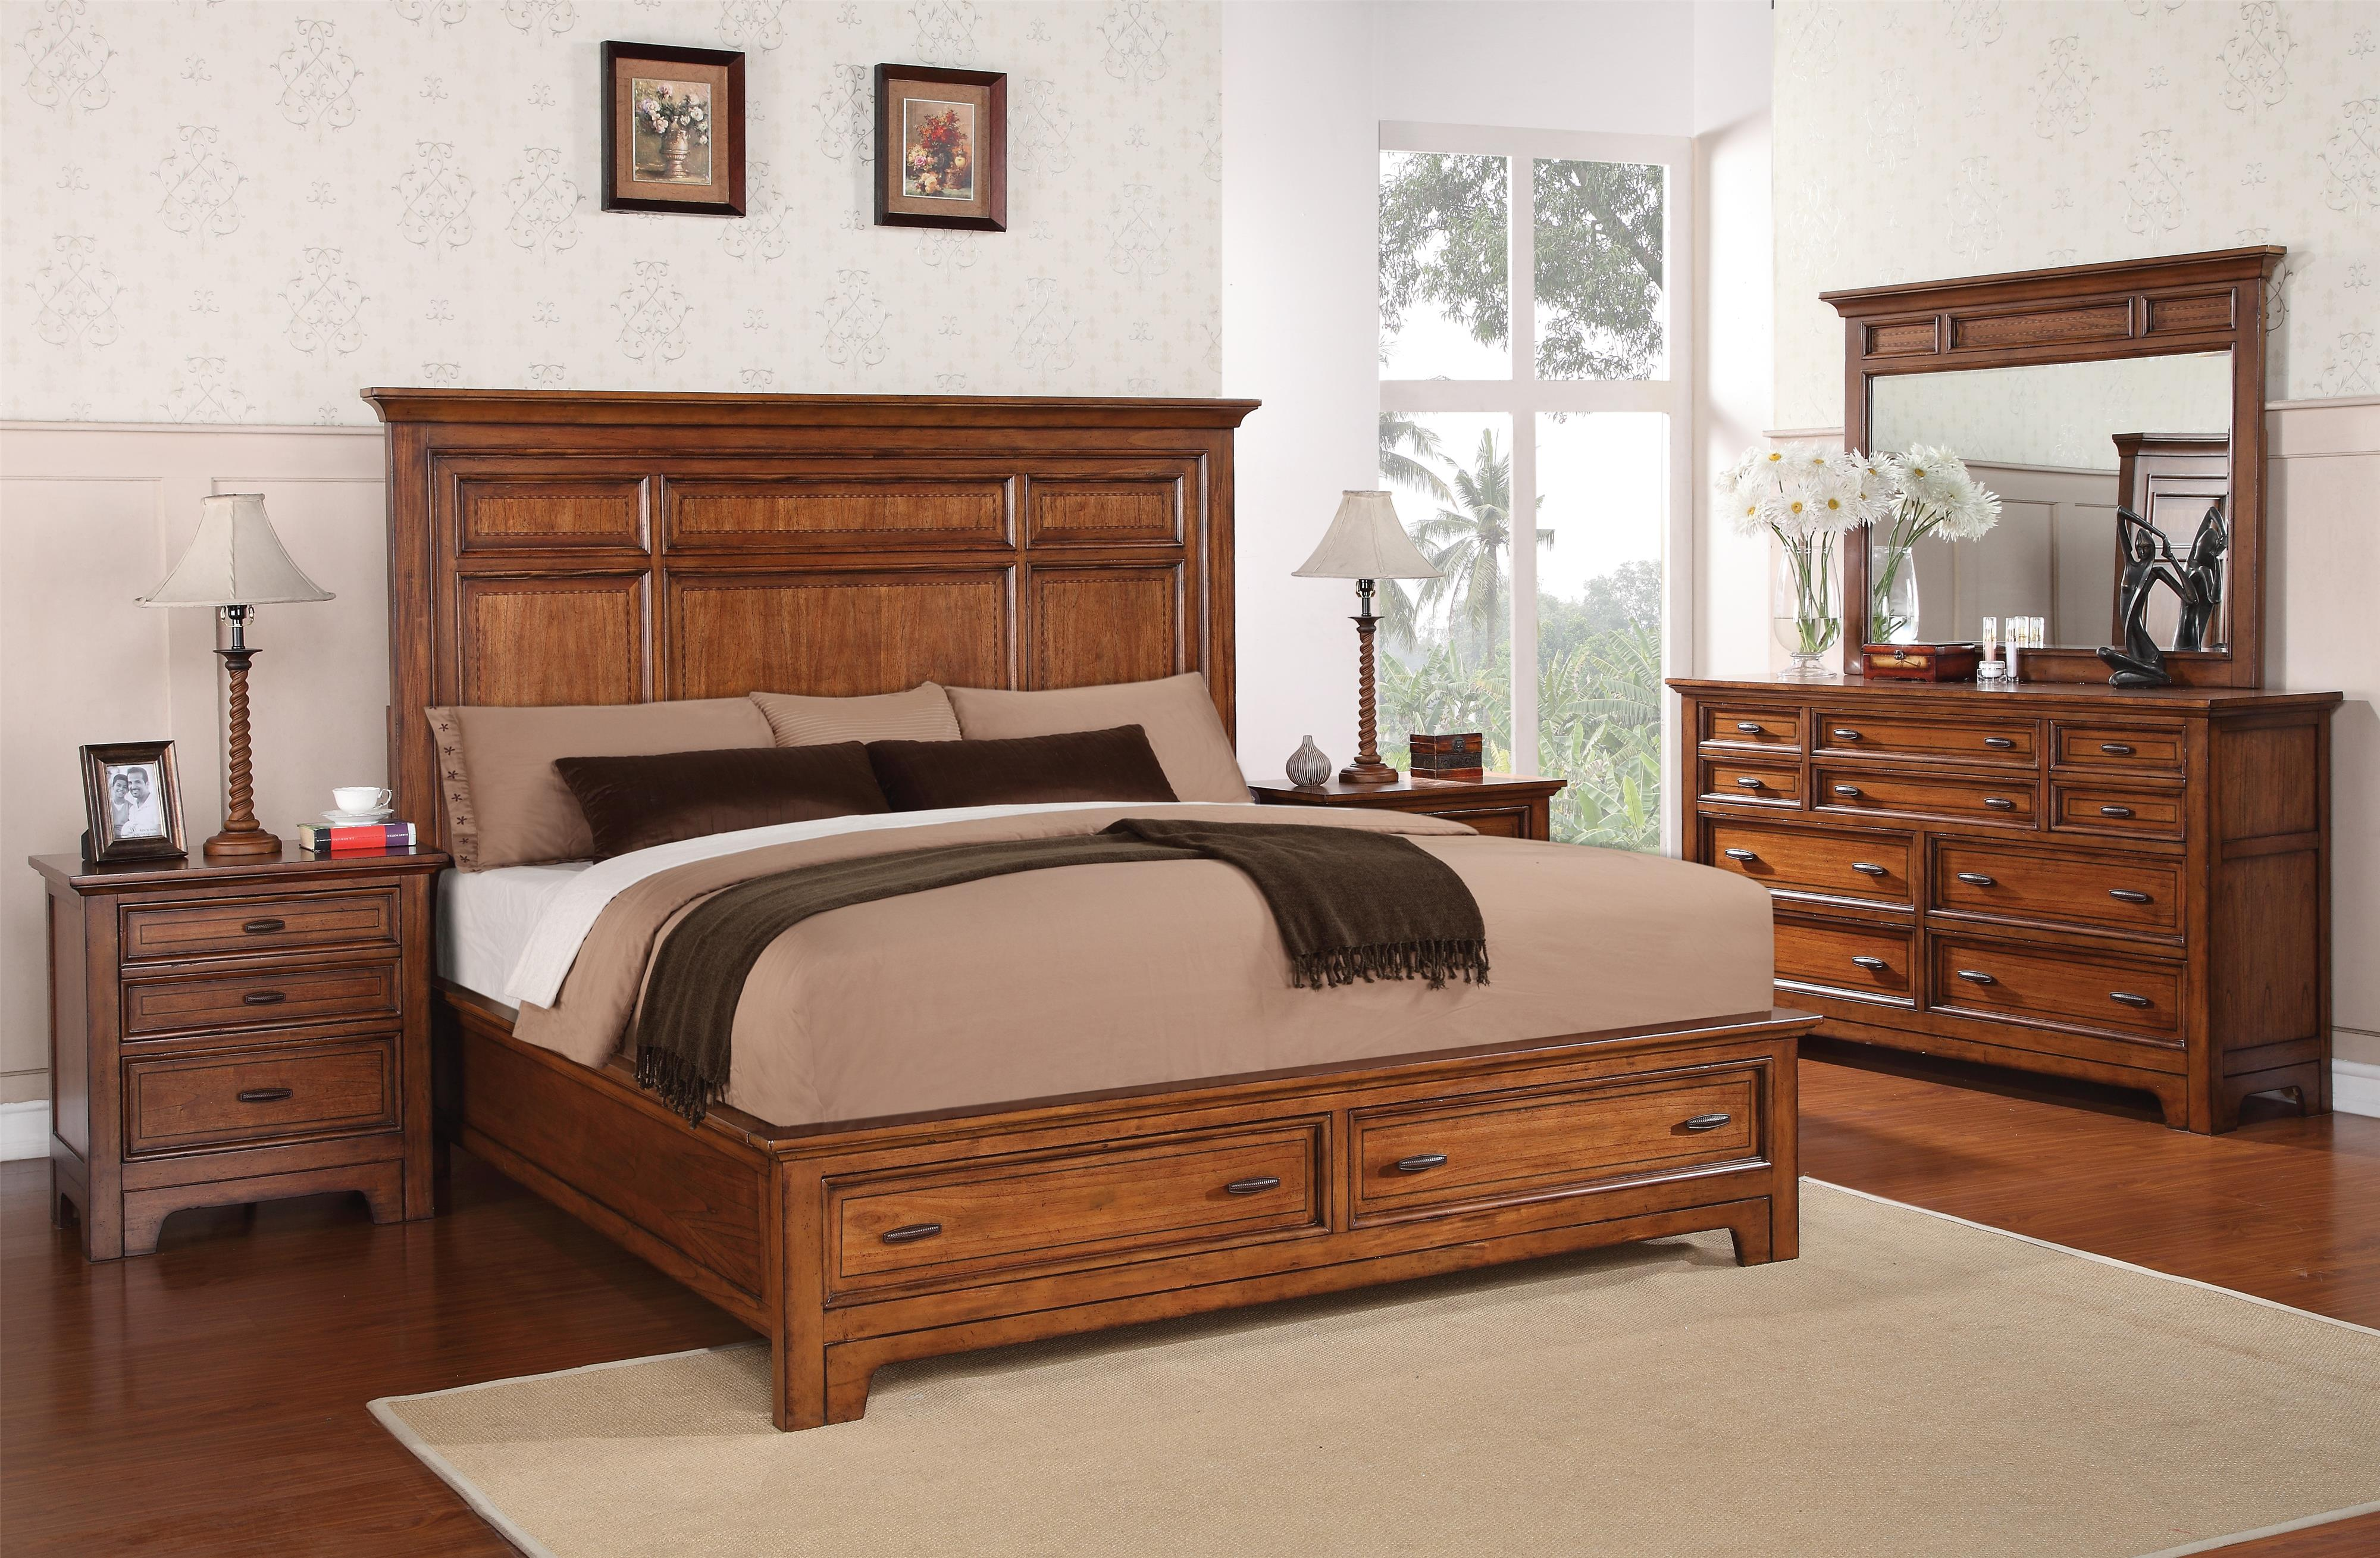 Flexsteel Wynwood Collection River Valley King Bedroom Group - Item Number: W1572 K Bedroom Group 2